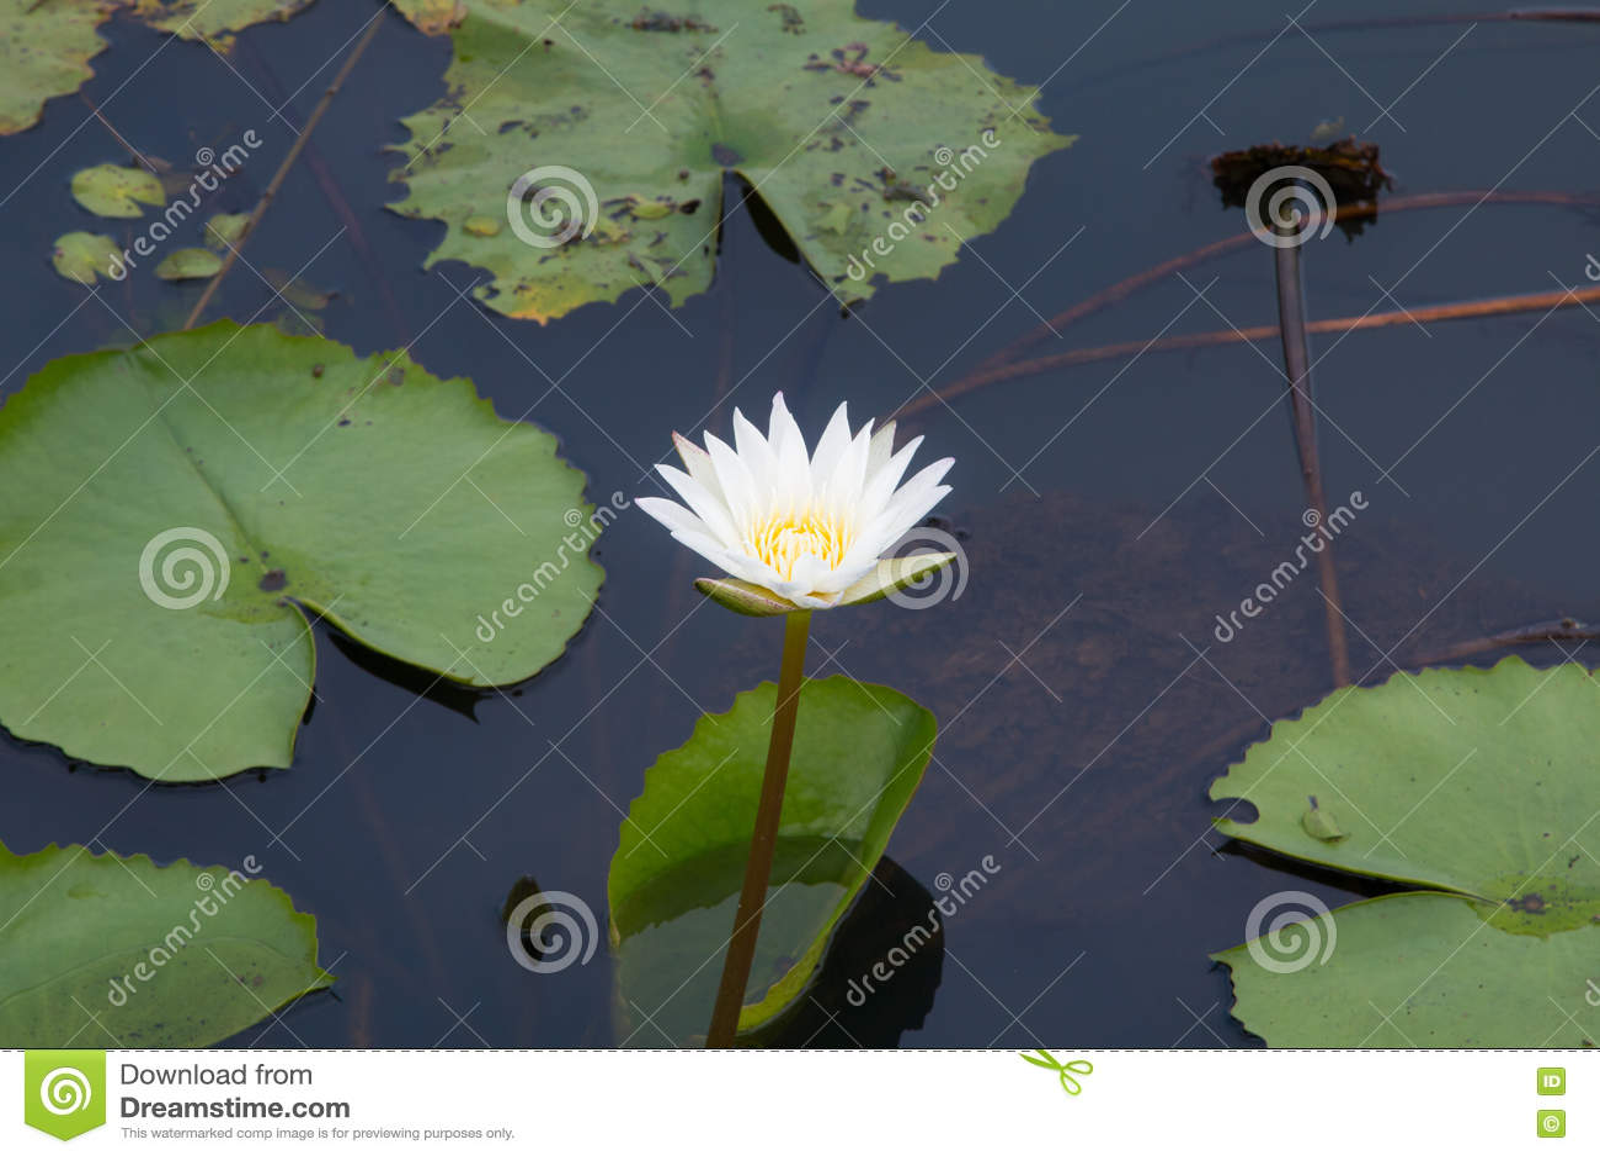 Lotus flower in pond stock illustration illustration of plant lotus flower in pond mightylinksfo